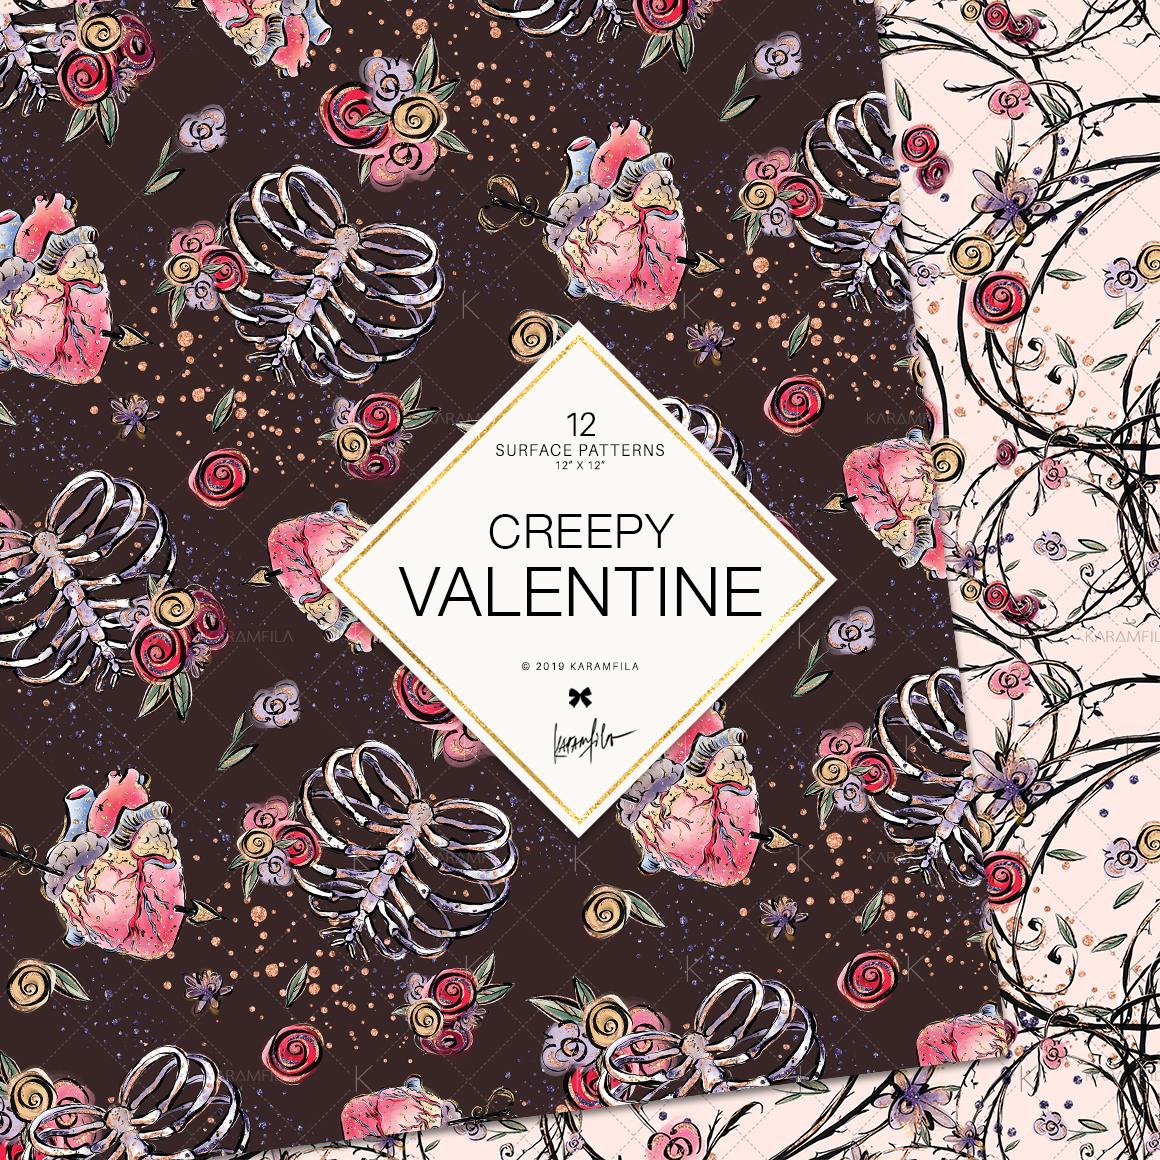 Creepy Valentine's Day Patterns example image 7